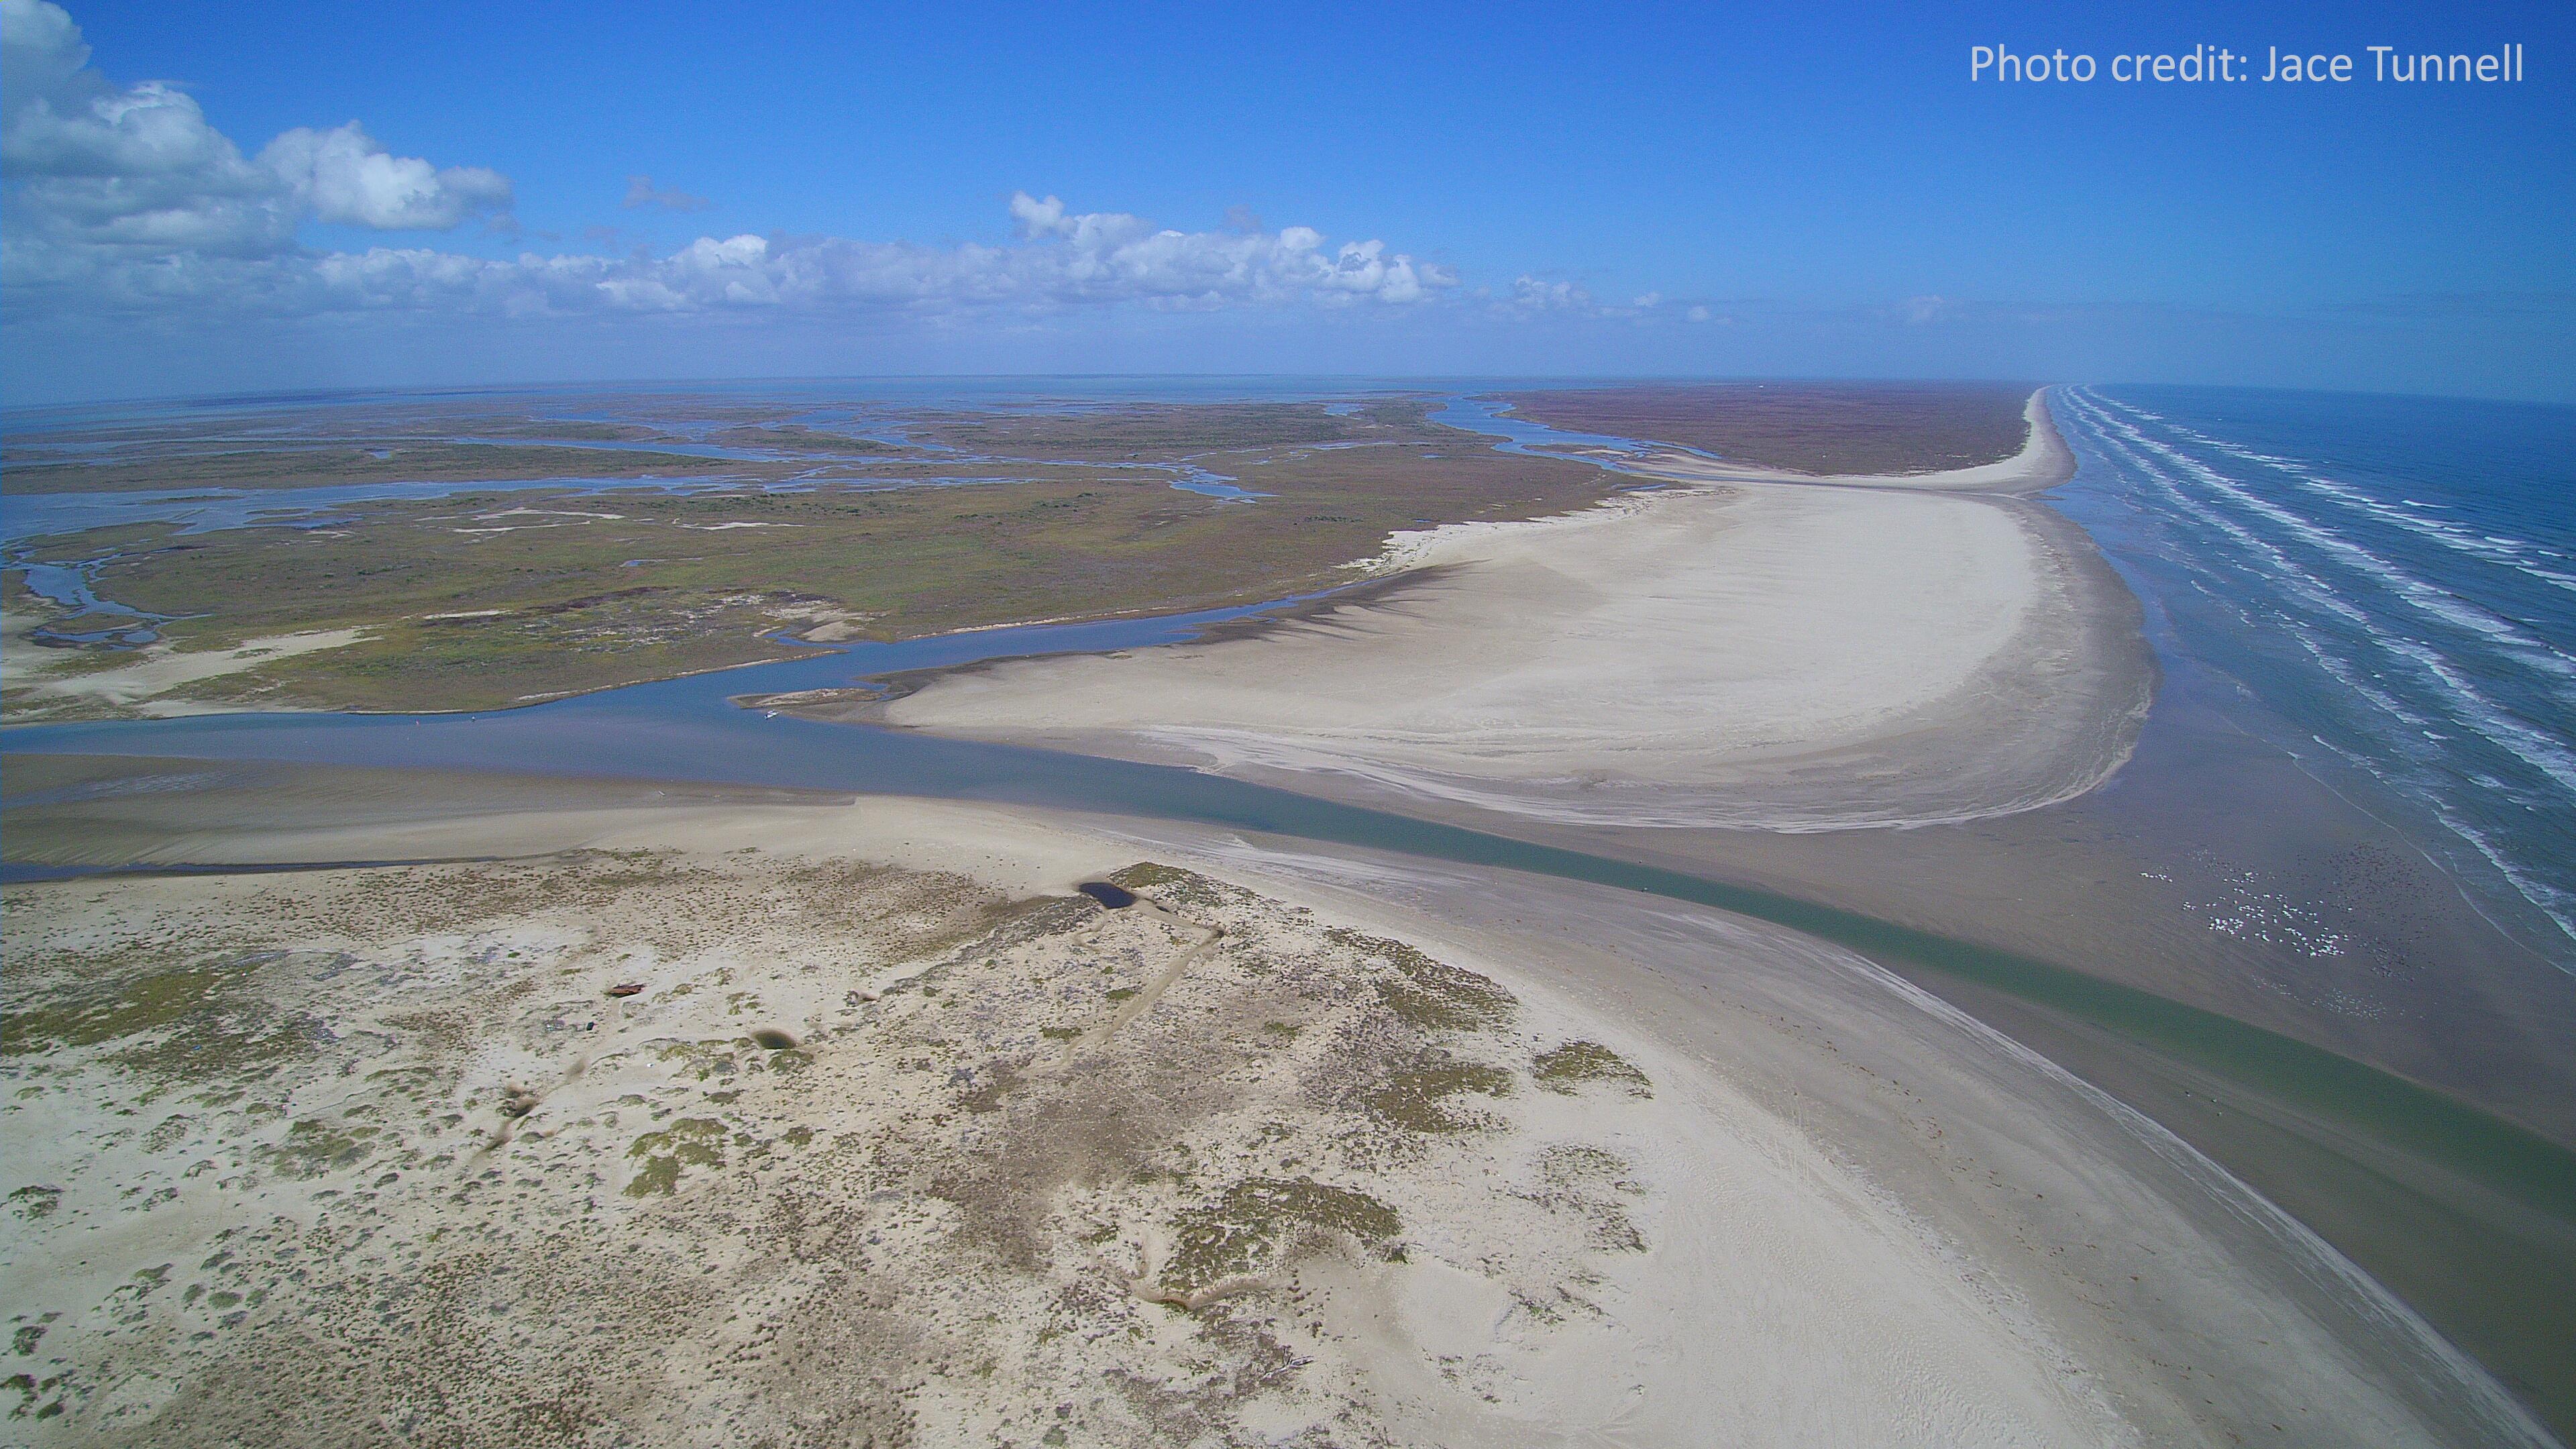 Estuary at Mission-Aransas National Estuarine Research Reserve, Texas